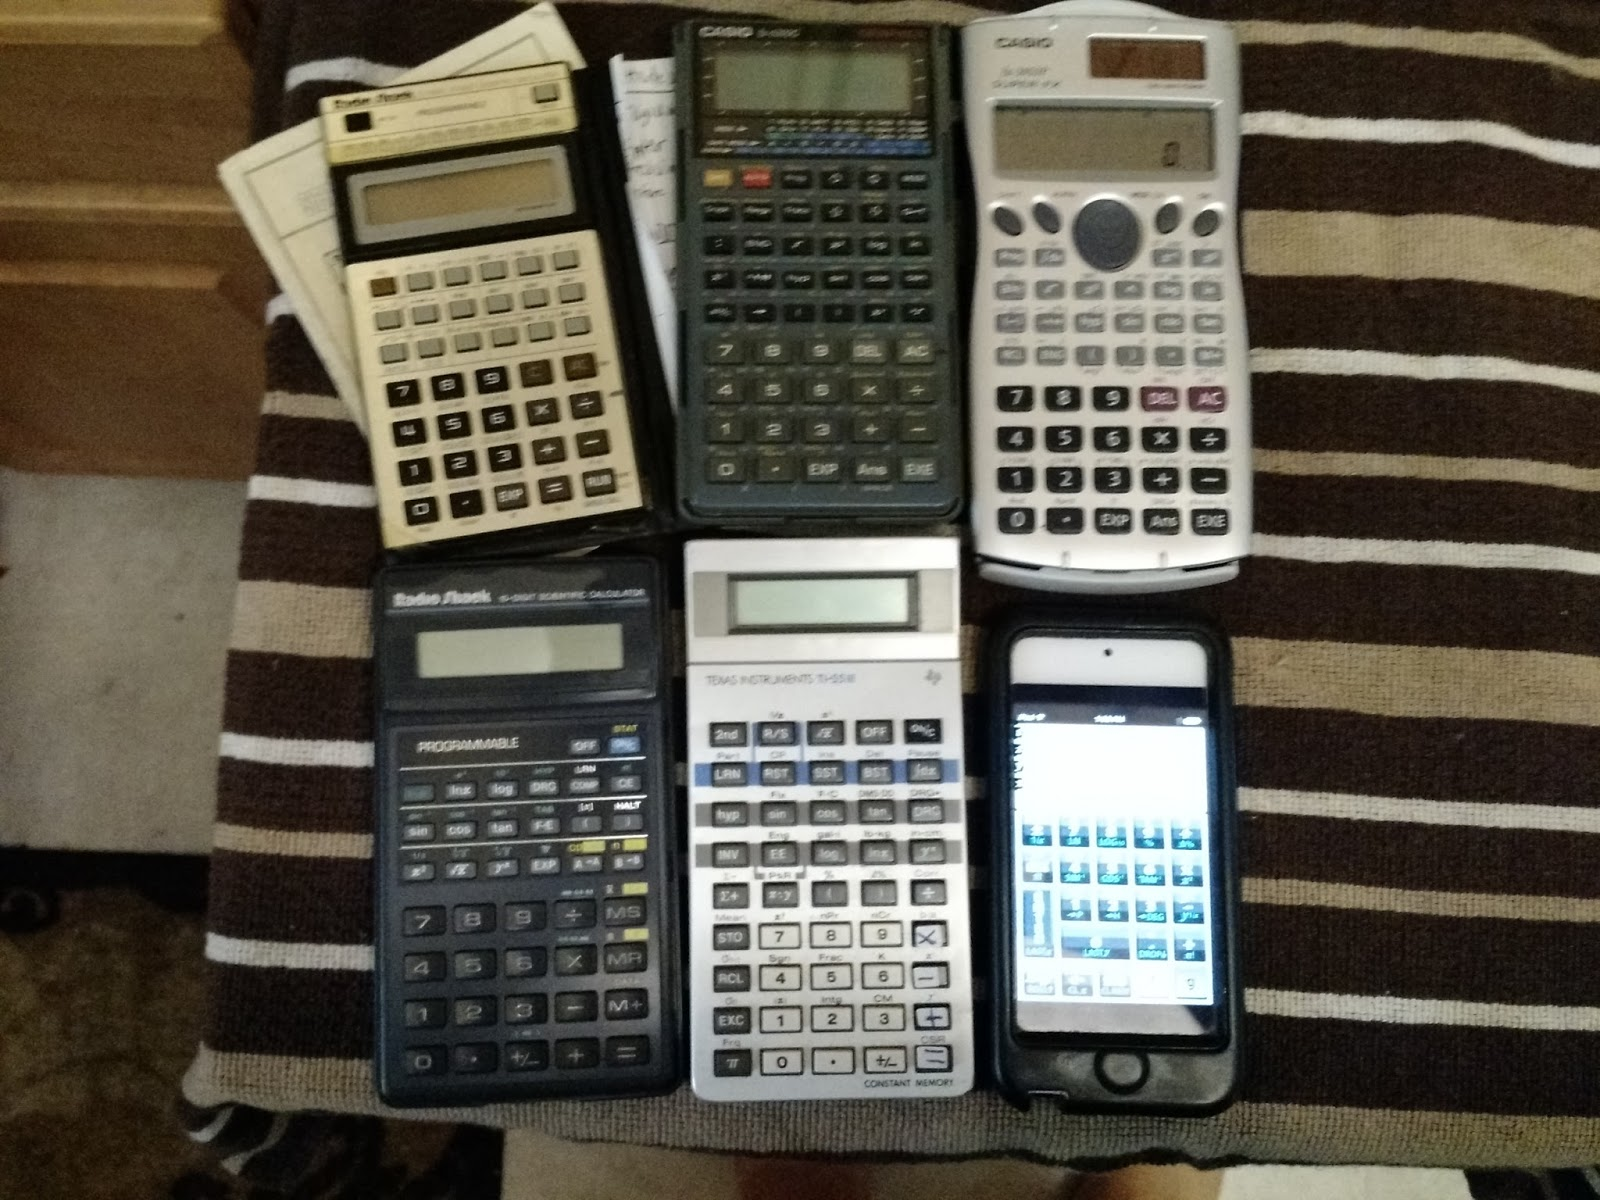 Eddie's Math and Calculator Blog: The Calculator Minimalist